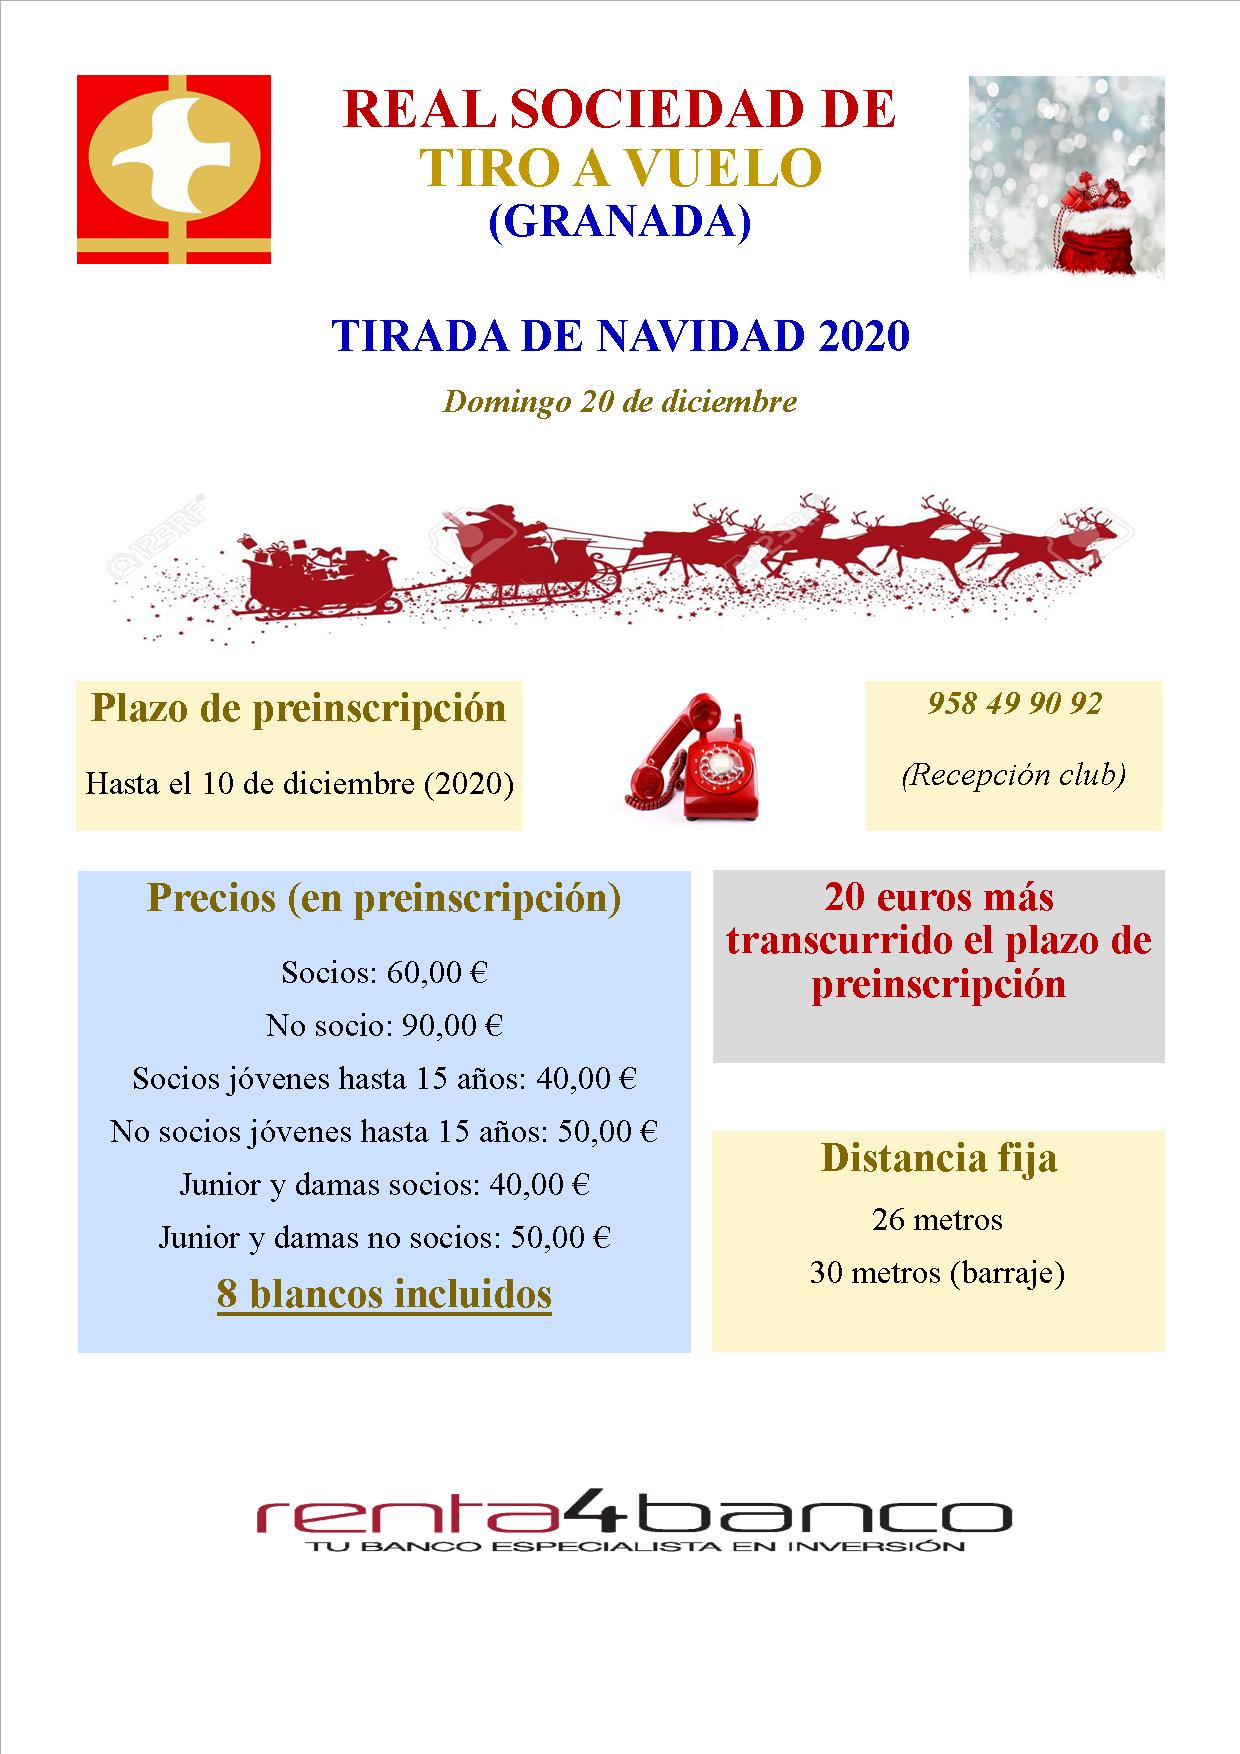 TIRADA DE NAVIDAD 2020